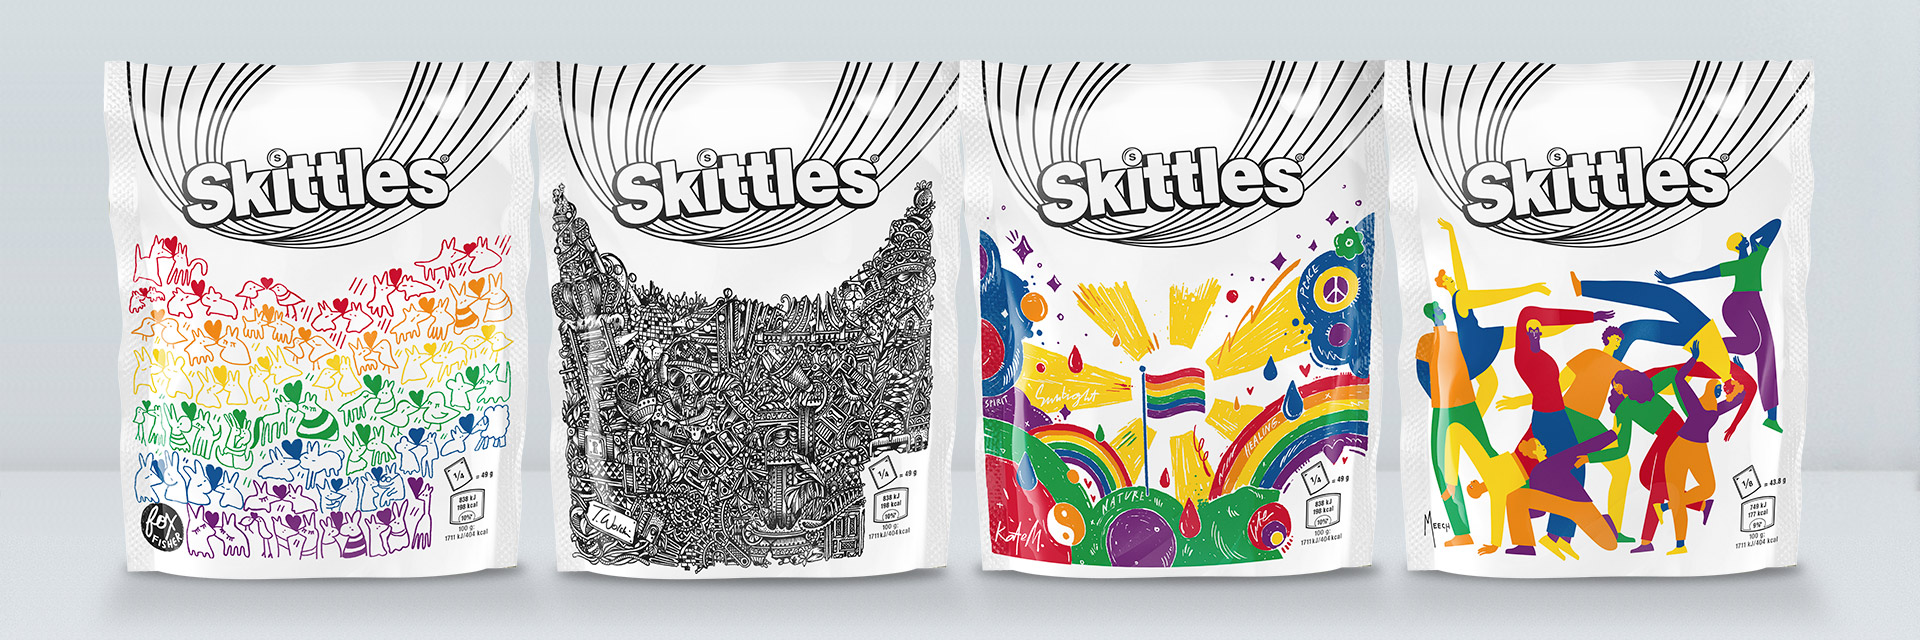 Straight Forward Skittles Pride 2019 Limited edition packaging: Packaging Design Range